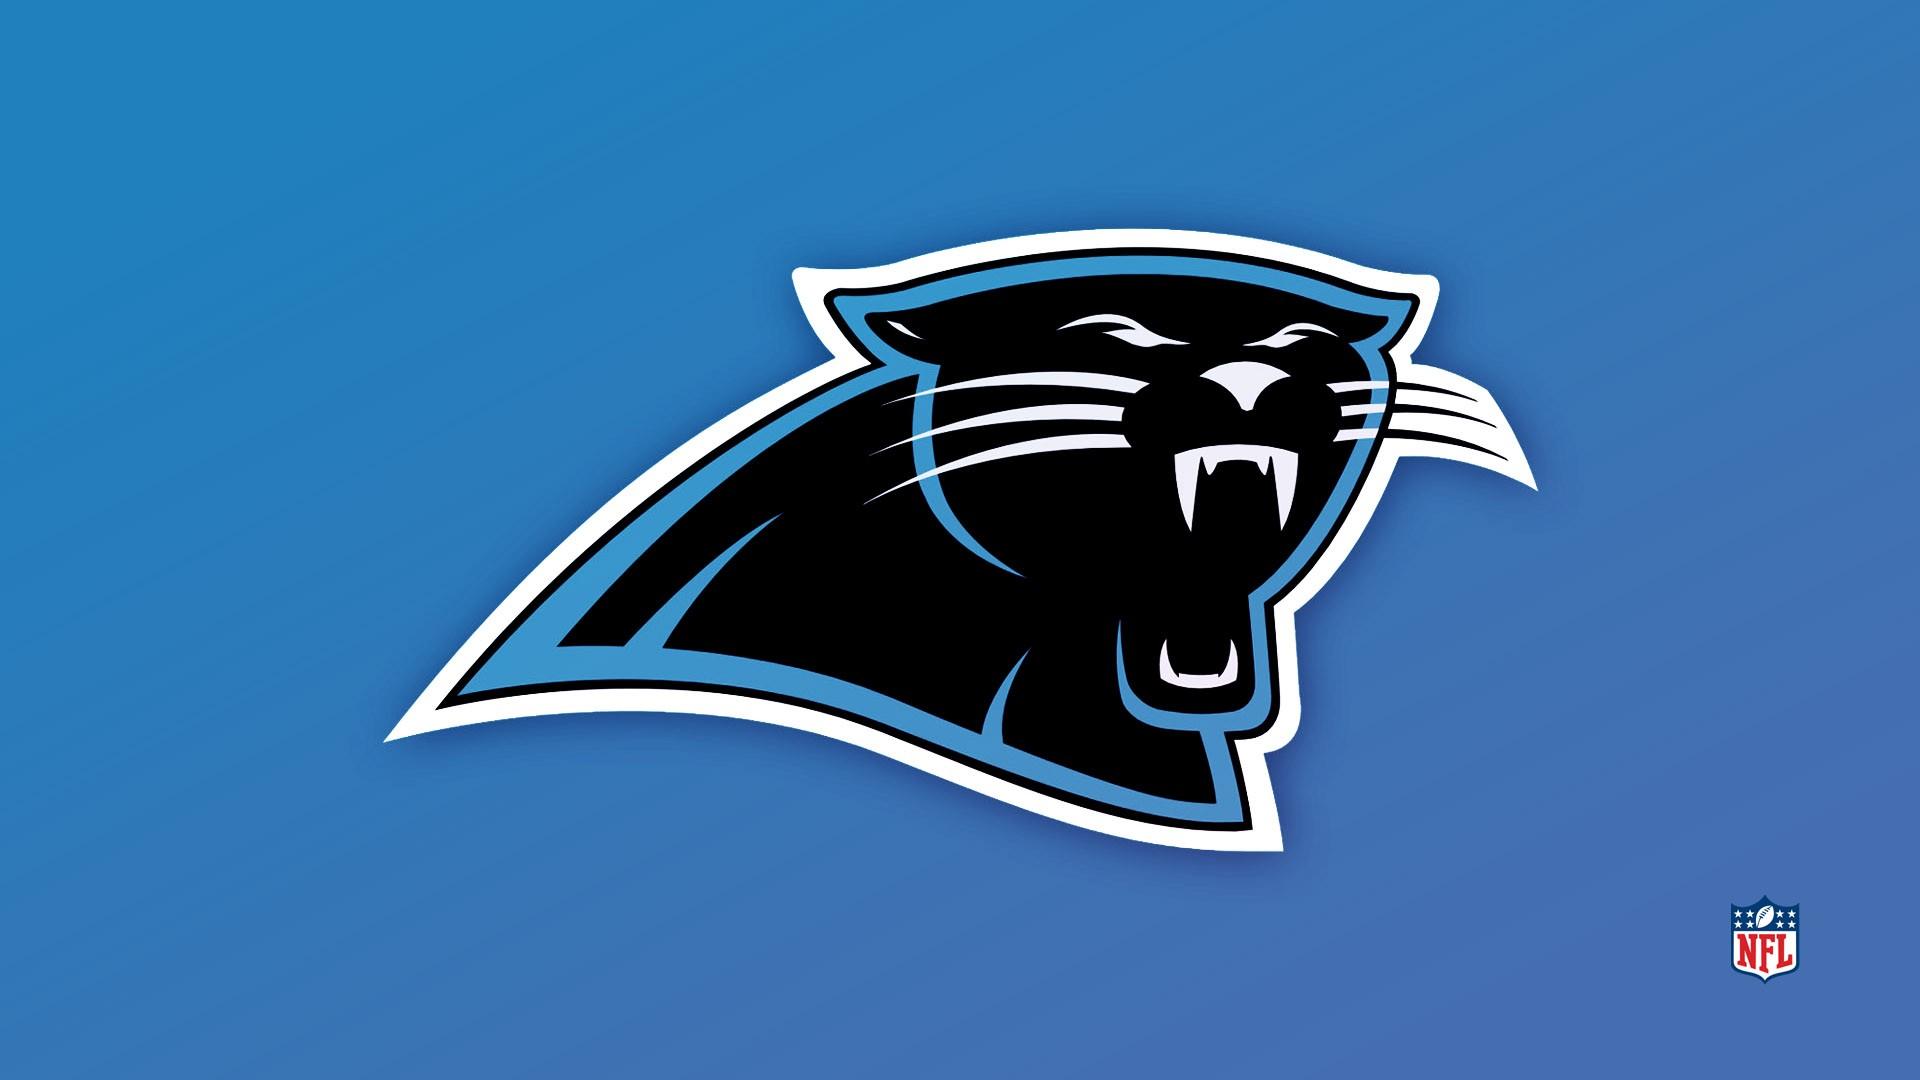 Panthers Wallpaper 1920x1080 Blue Panthers NFL Carolina Panthers 1920x1080